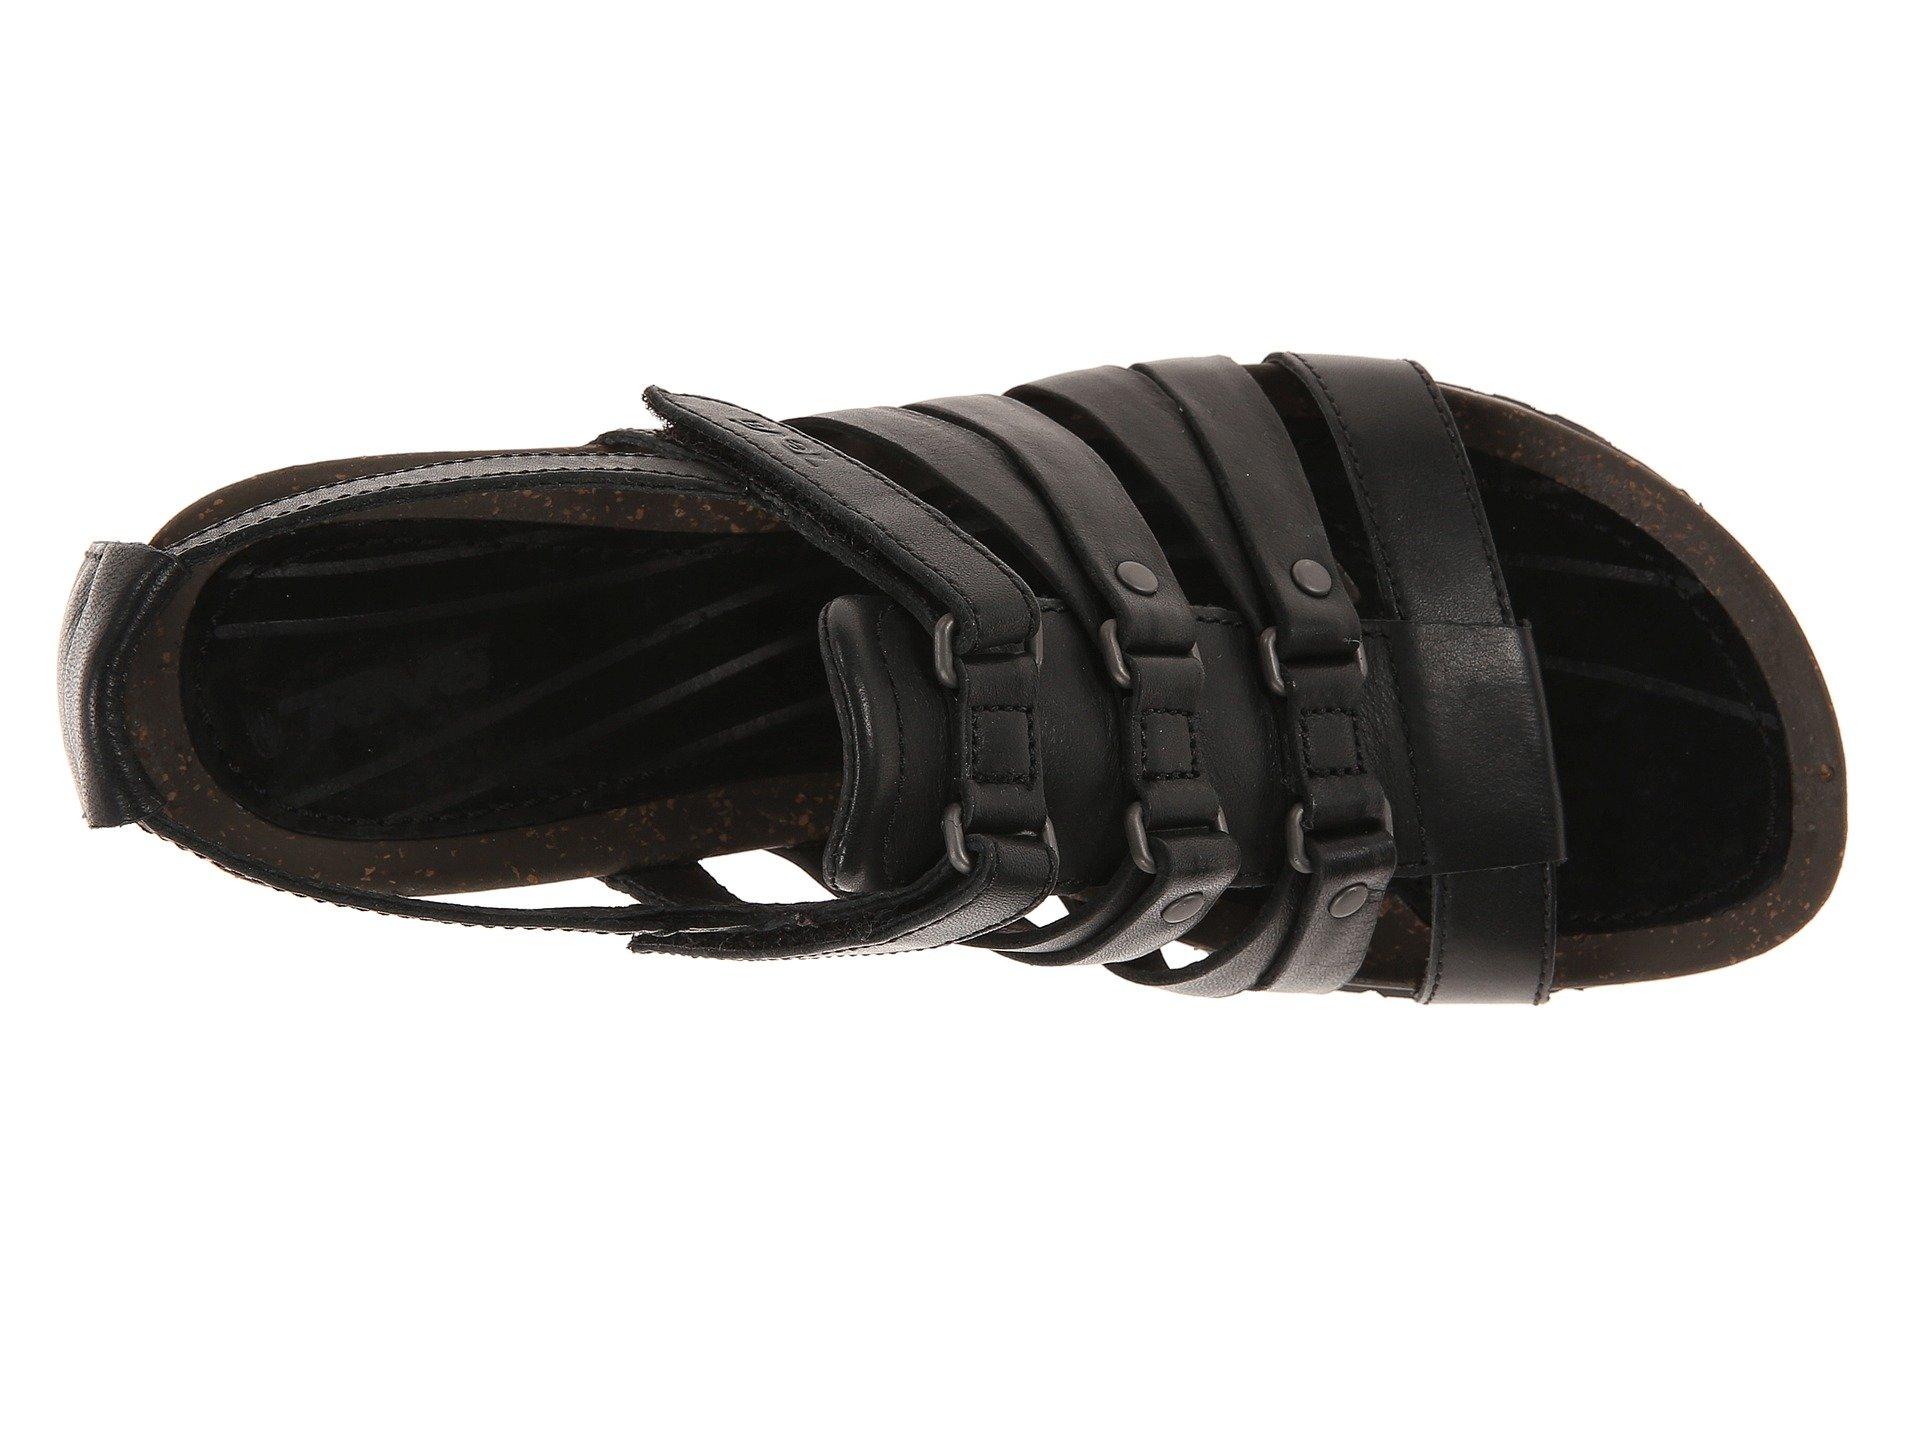 Teva Cabrillo Sandal At 6pm